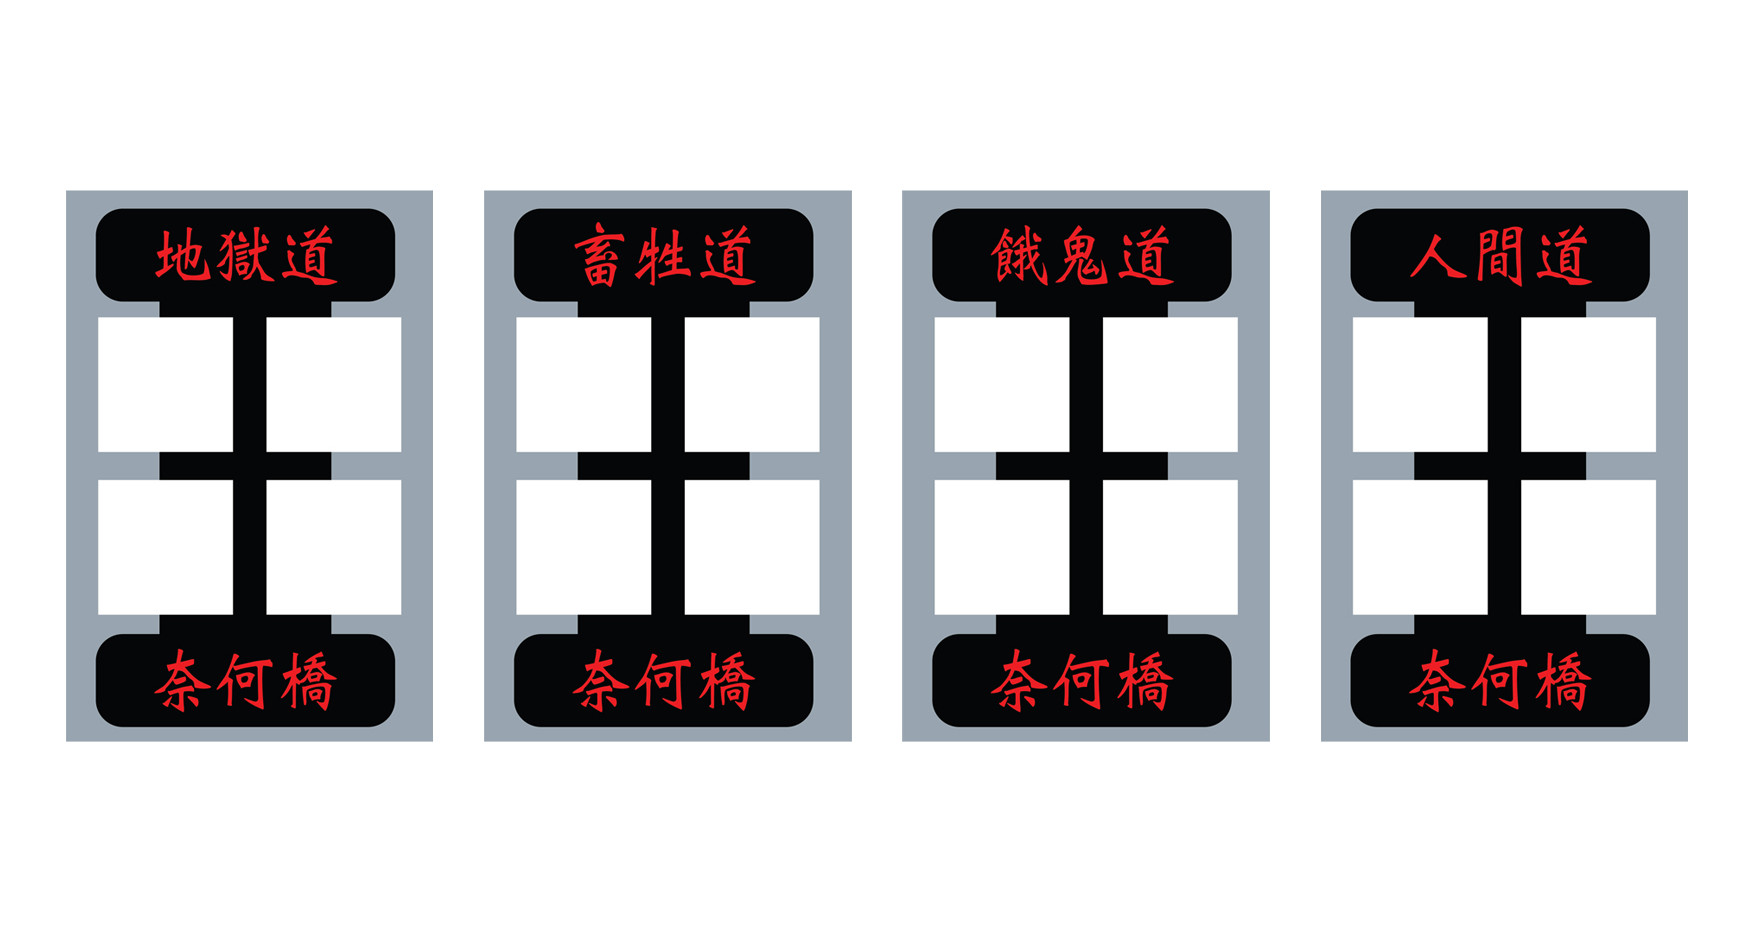 boardgame_六道輪迴創意發展計_180727_Page_07.jpg